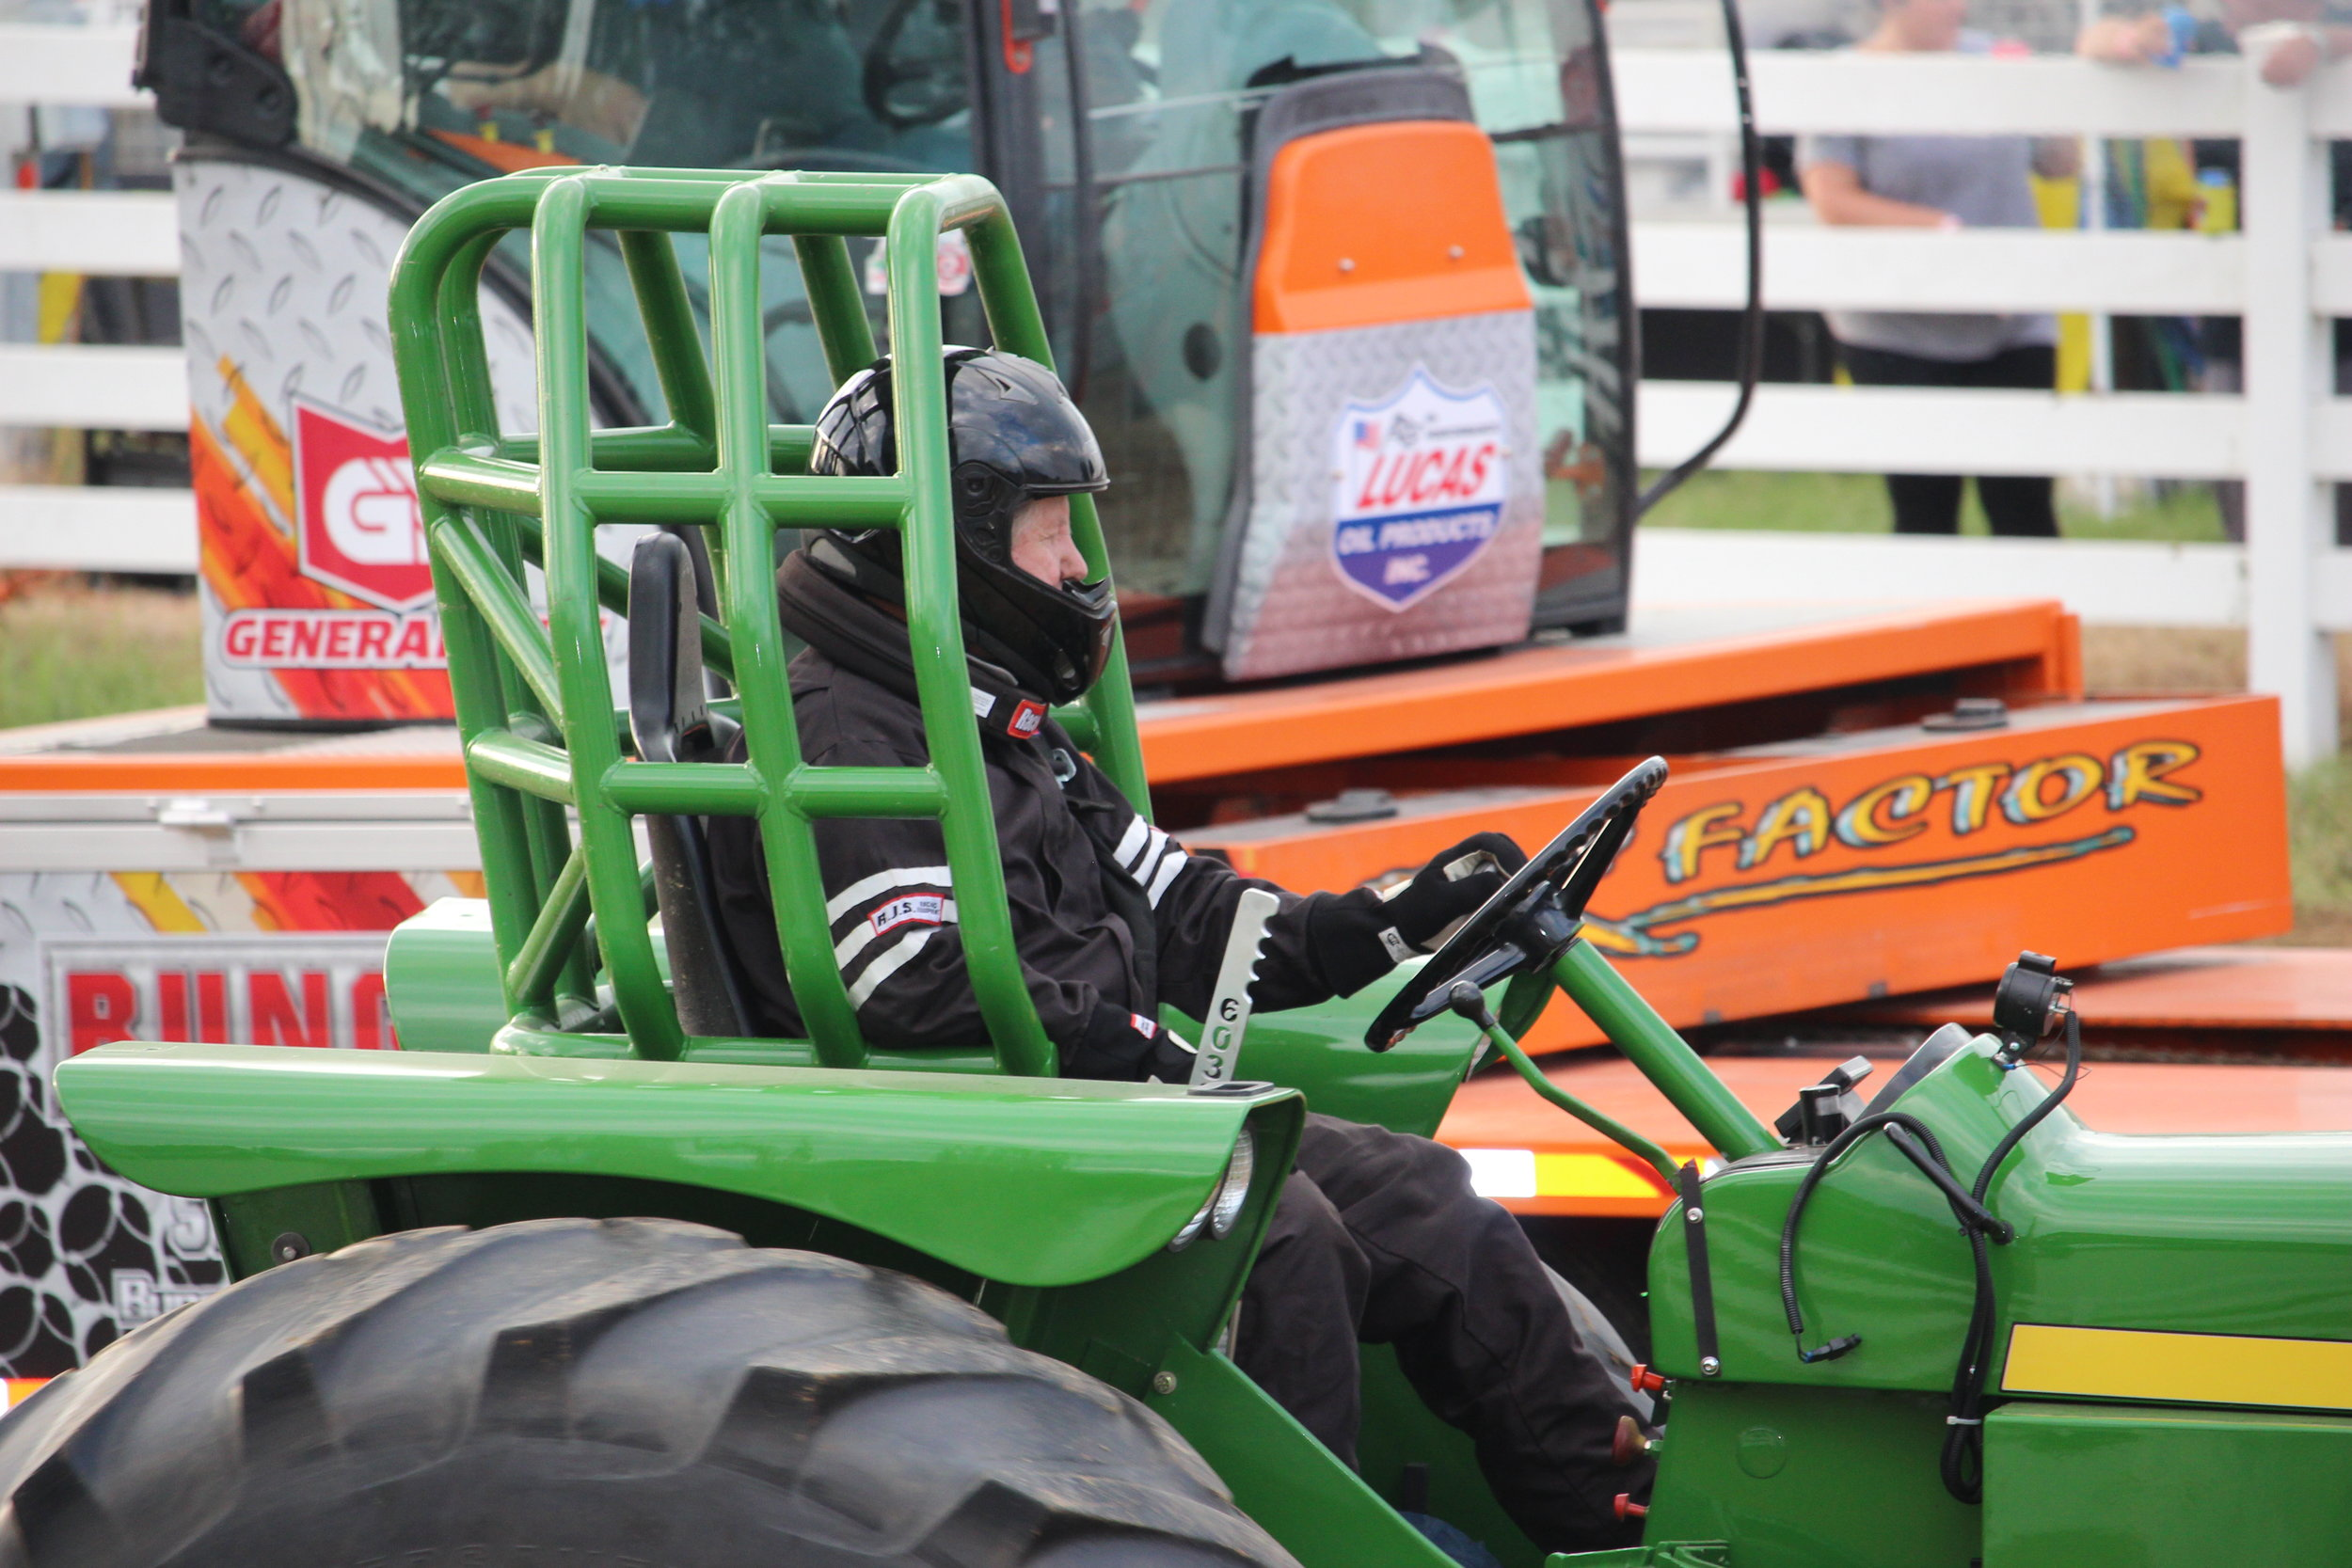 tractor pull 7.JPG